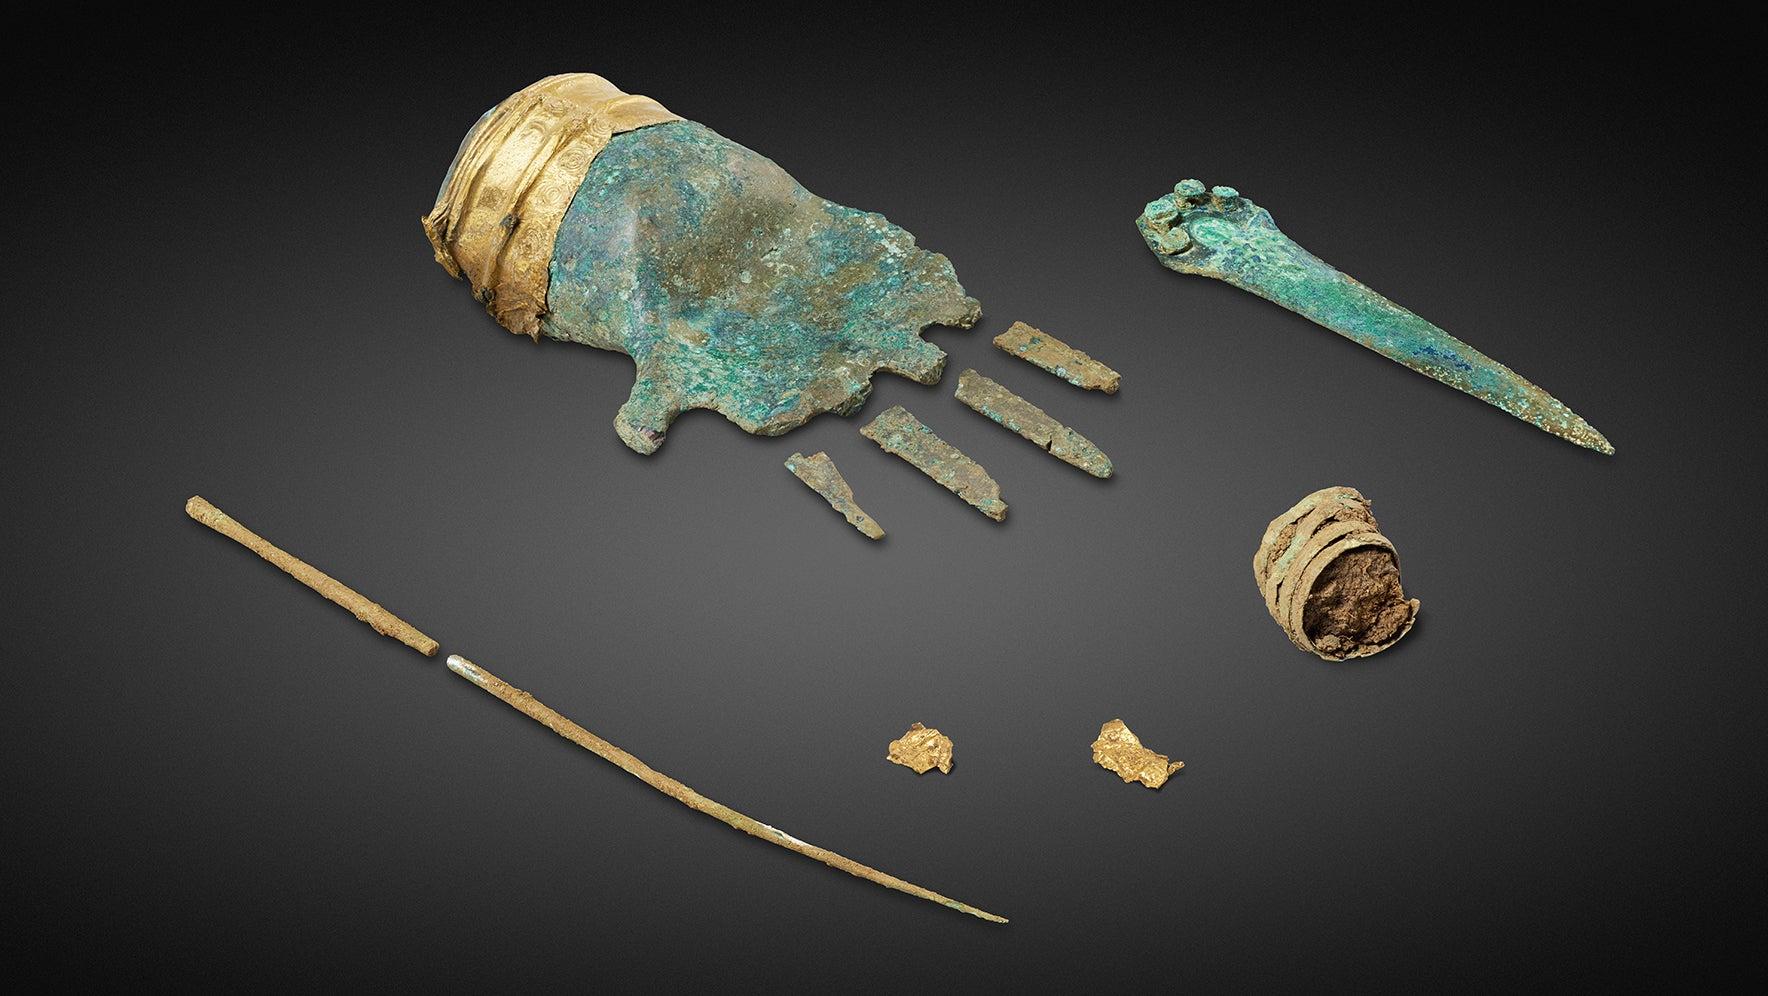 Ancient Bronze Hand Found In Switzerland Mystifies Archaeologists